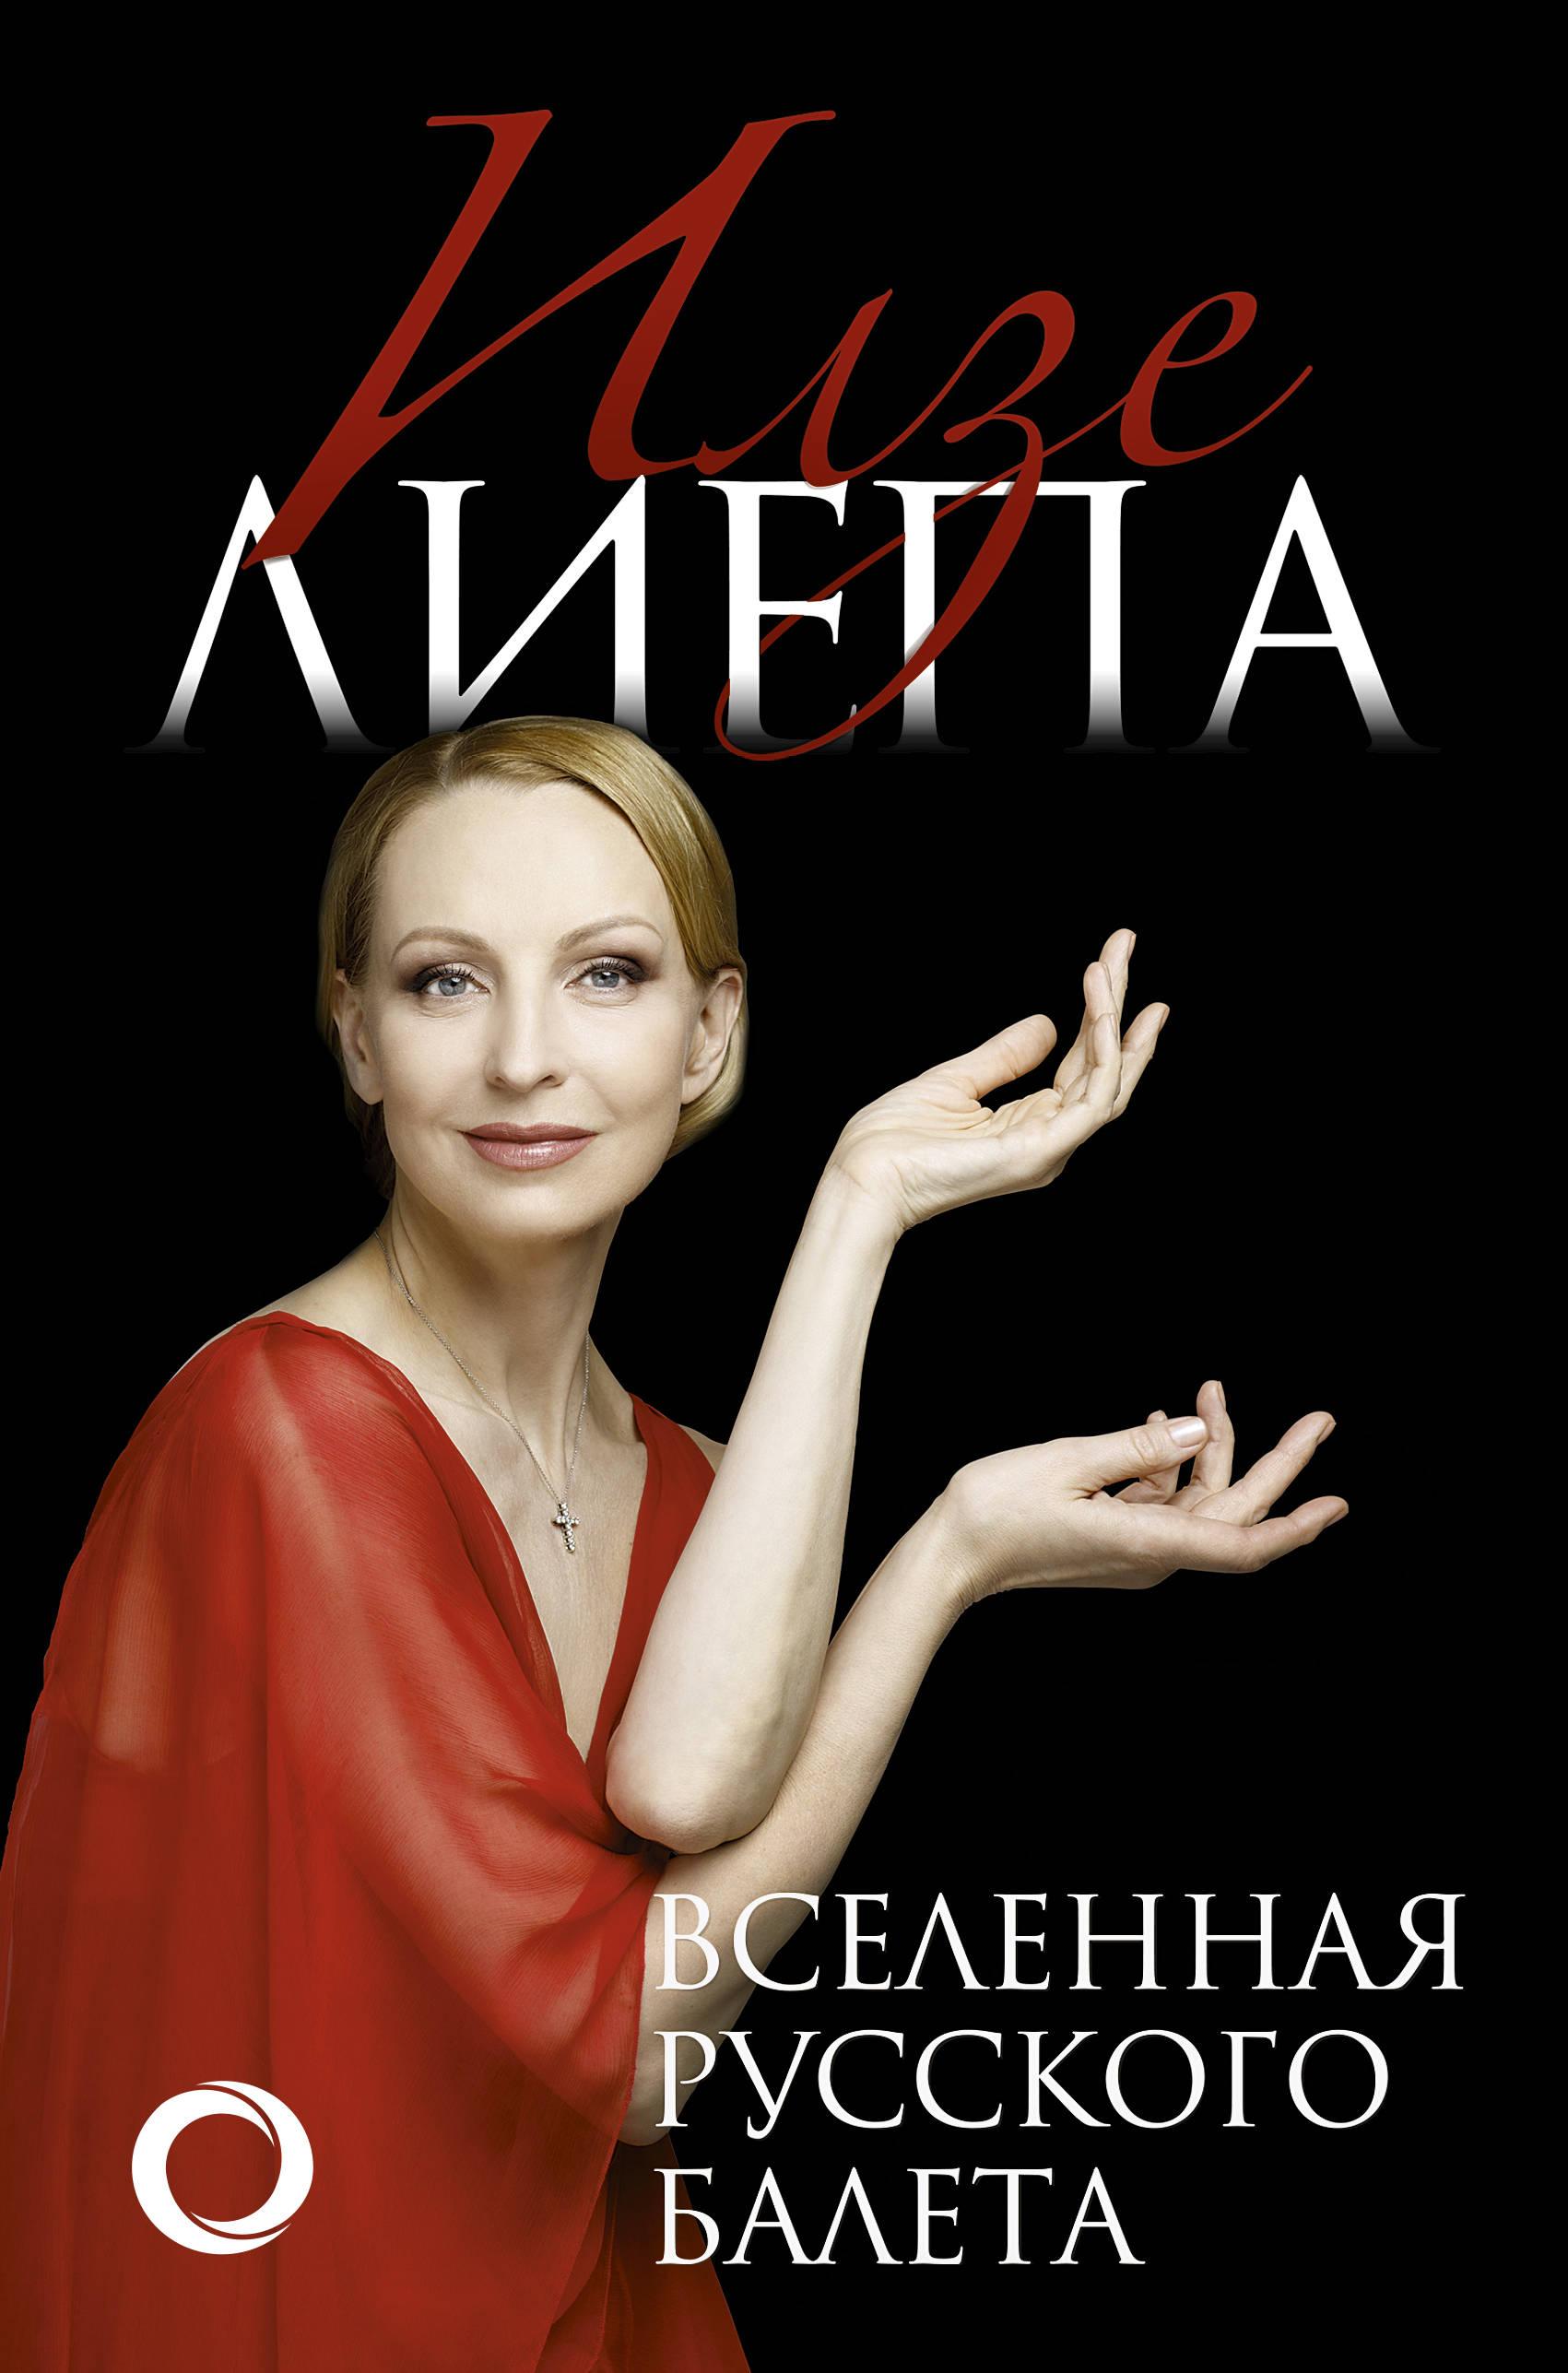 Vselennaja russkogo baleta